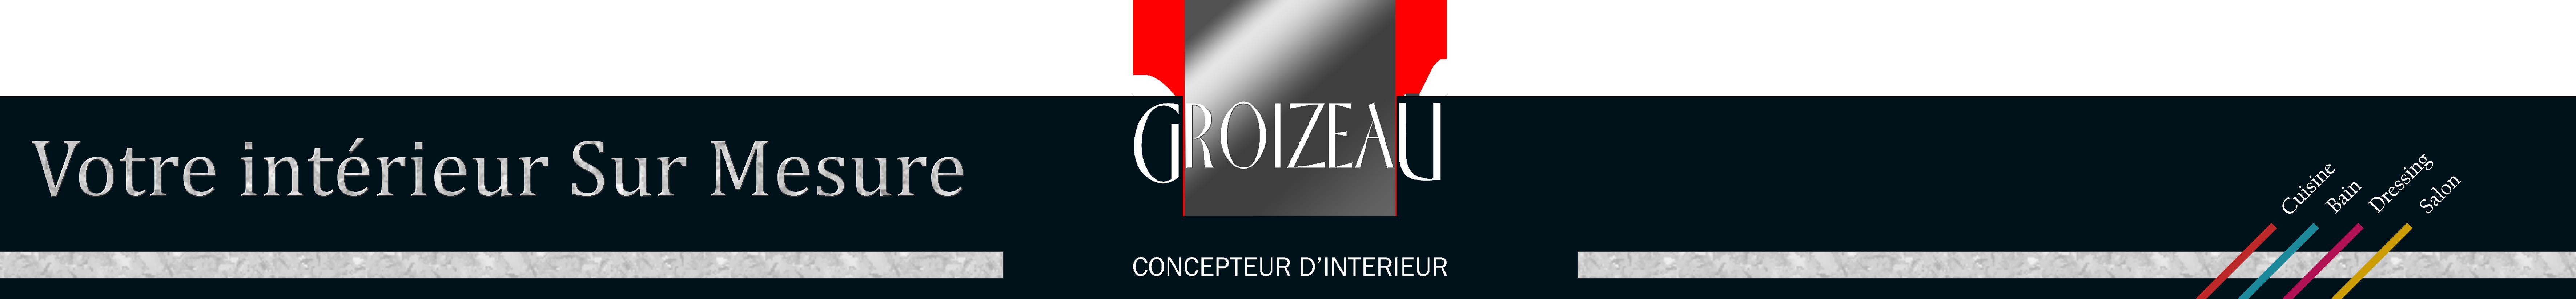 banderole stand groizeau habitat 2018